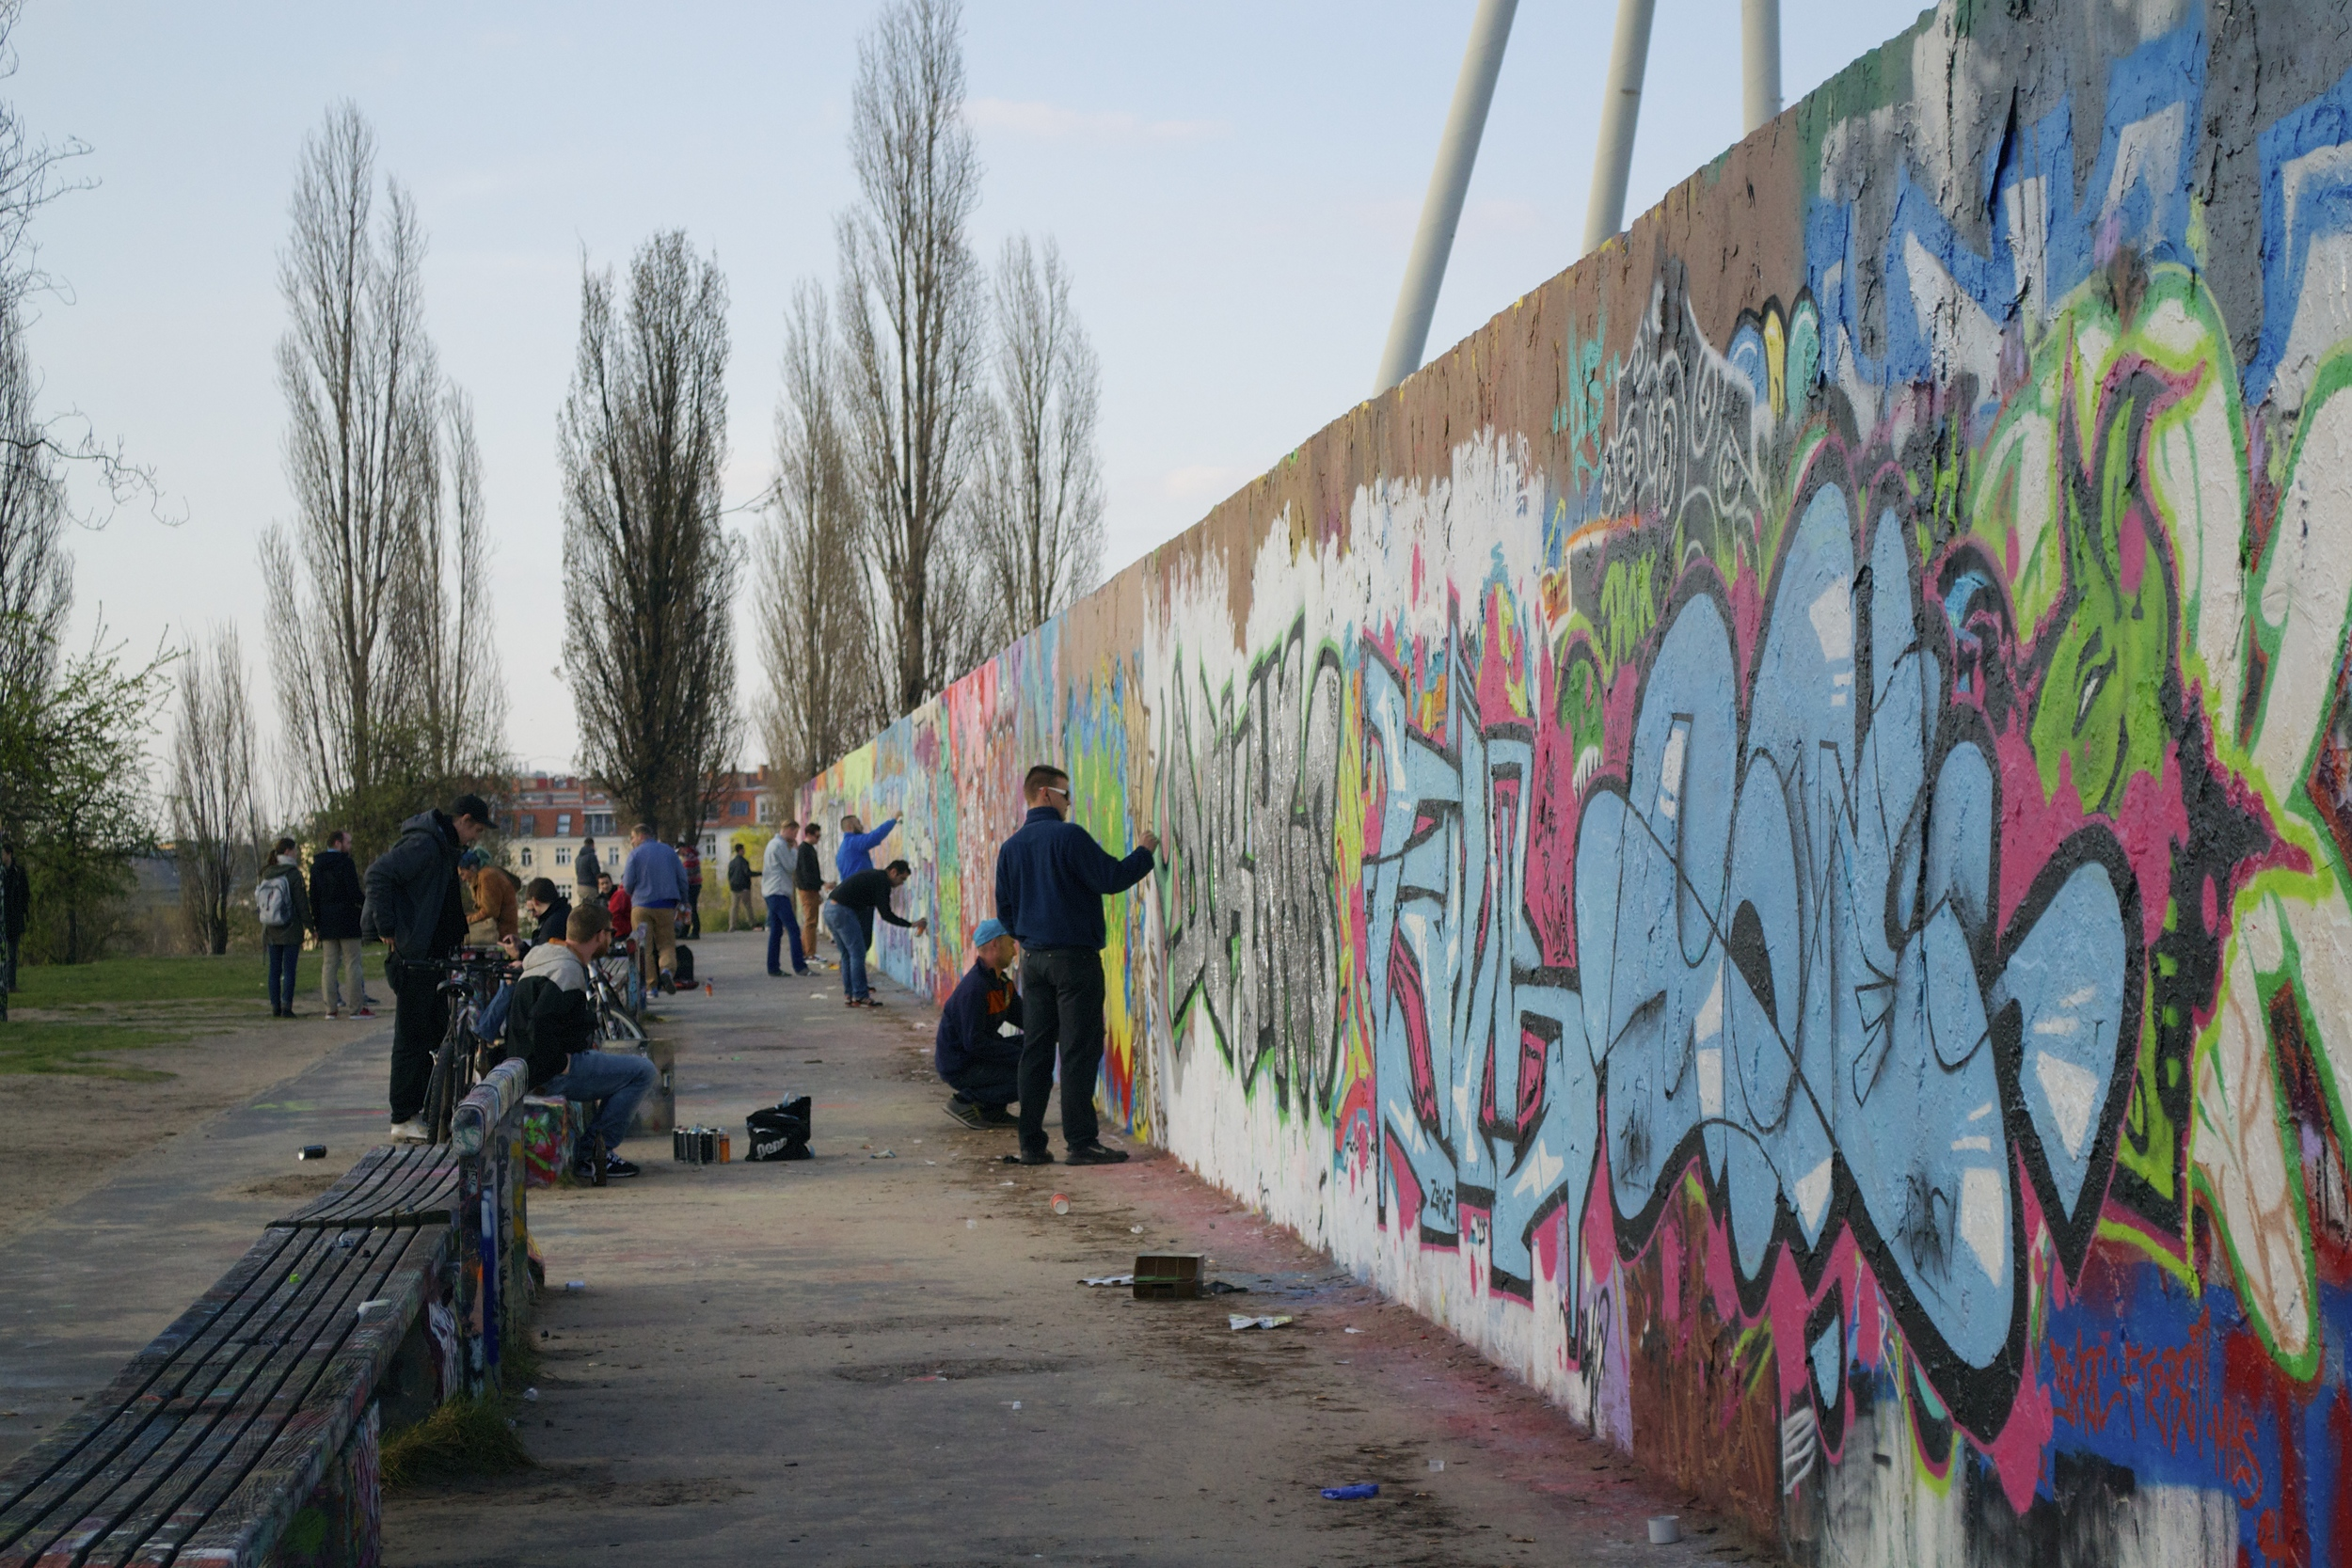 Graffiti artsits at work at the Mauerpark.